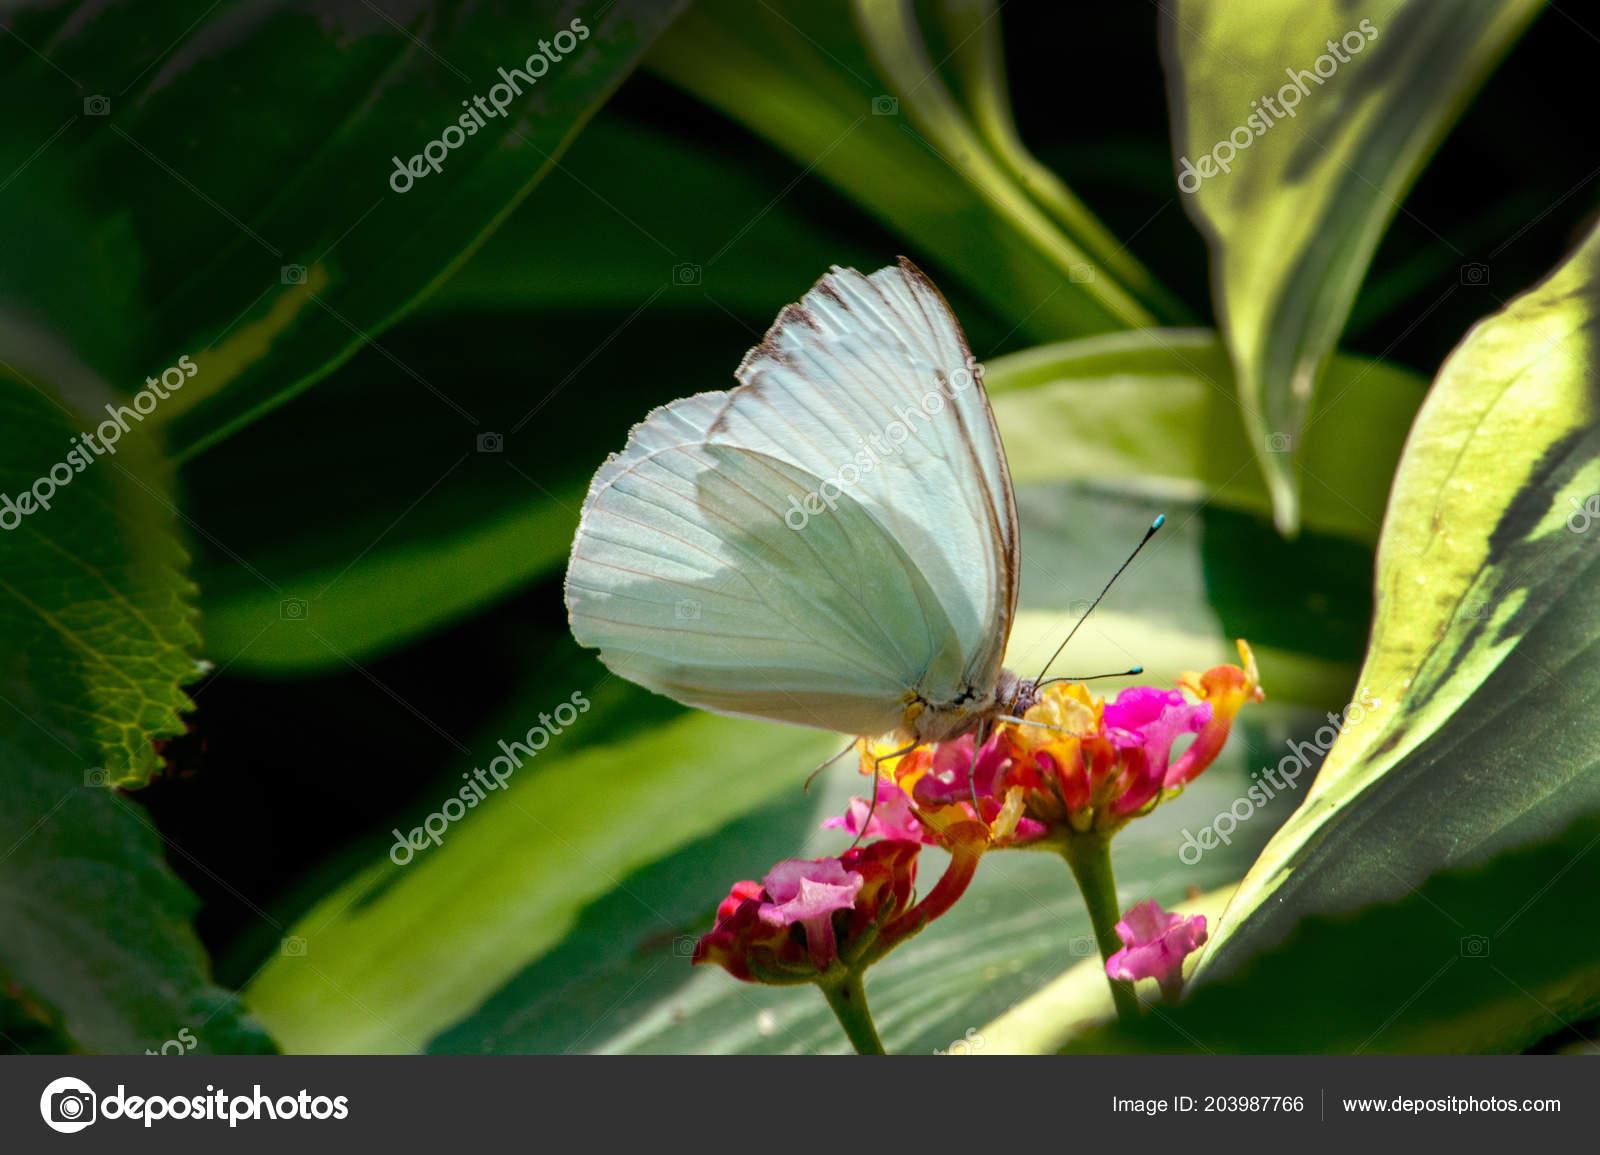 Beautiful white butterfly pretty garden enjoys sip colorful flowers a beautiful white butterfly in a pretty garden enjoys a sip from colorful flowers photo by inyrdreams mightylinksfo